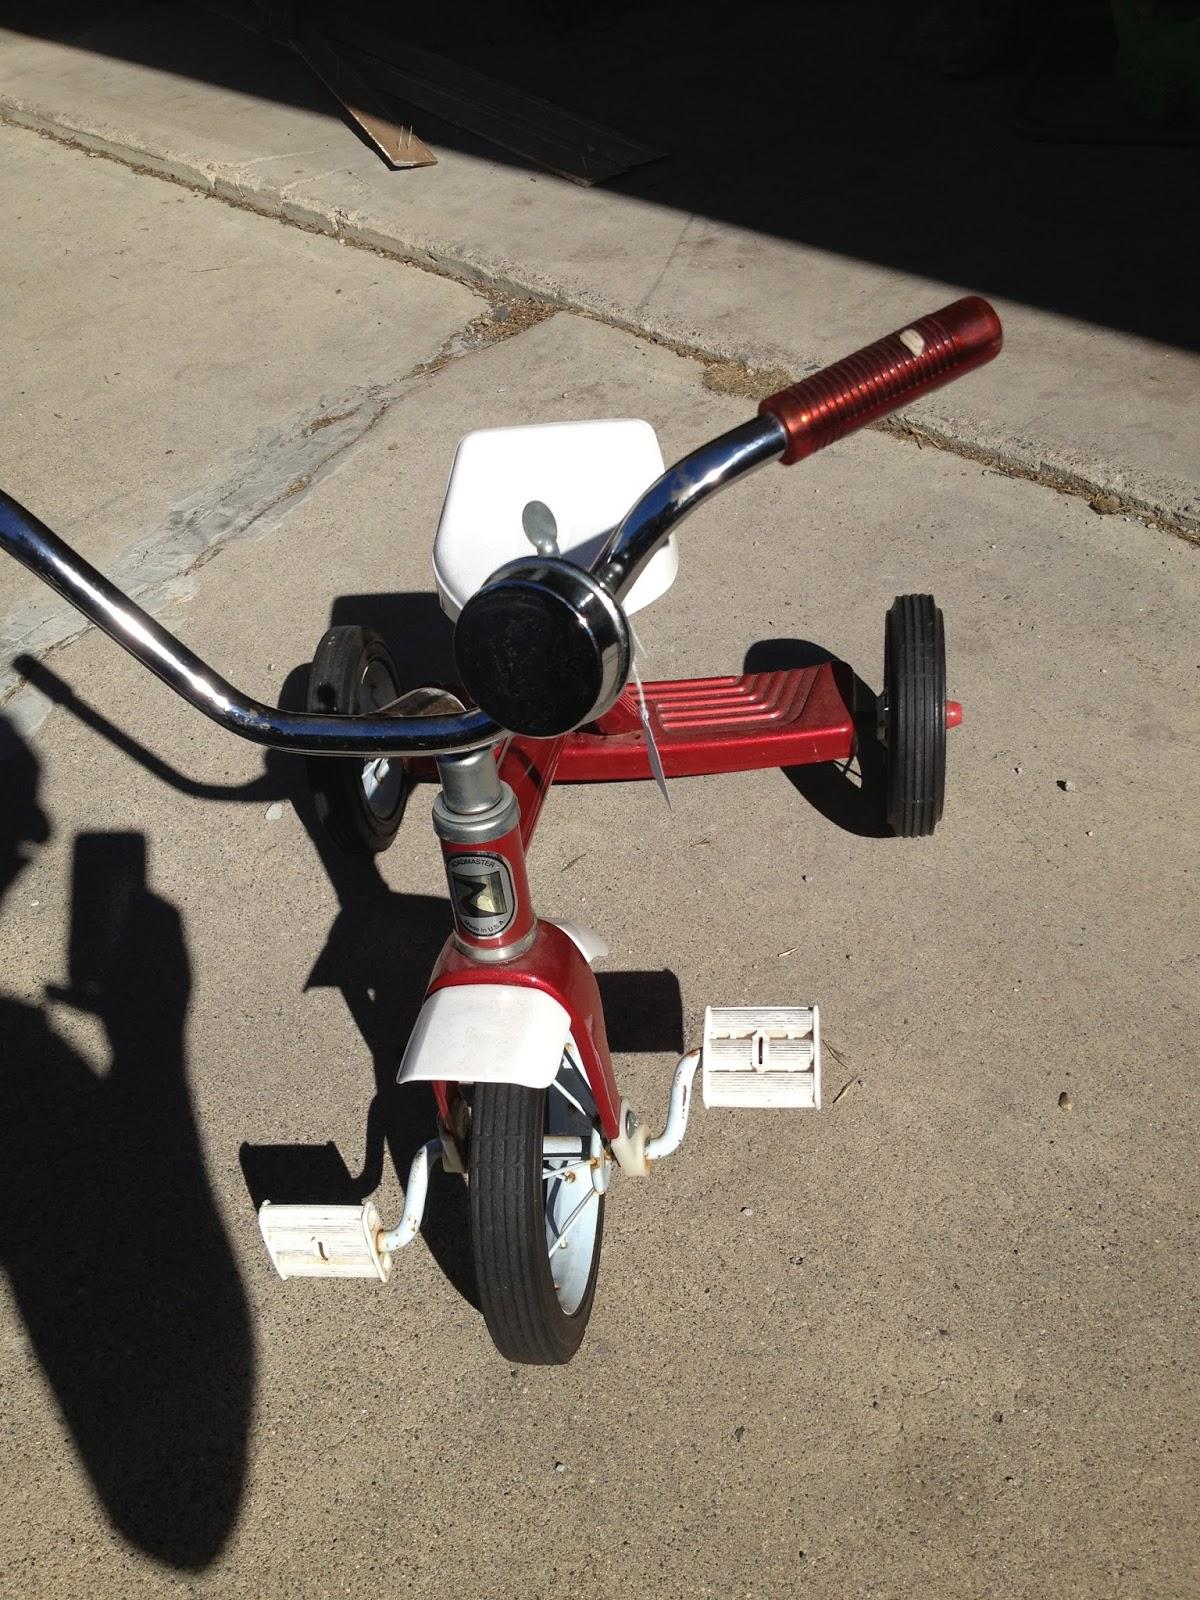 The eBay Freshman: Garage Sale Finds 8/3/13